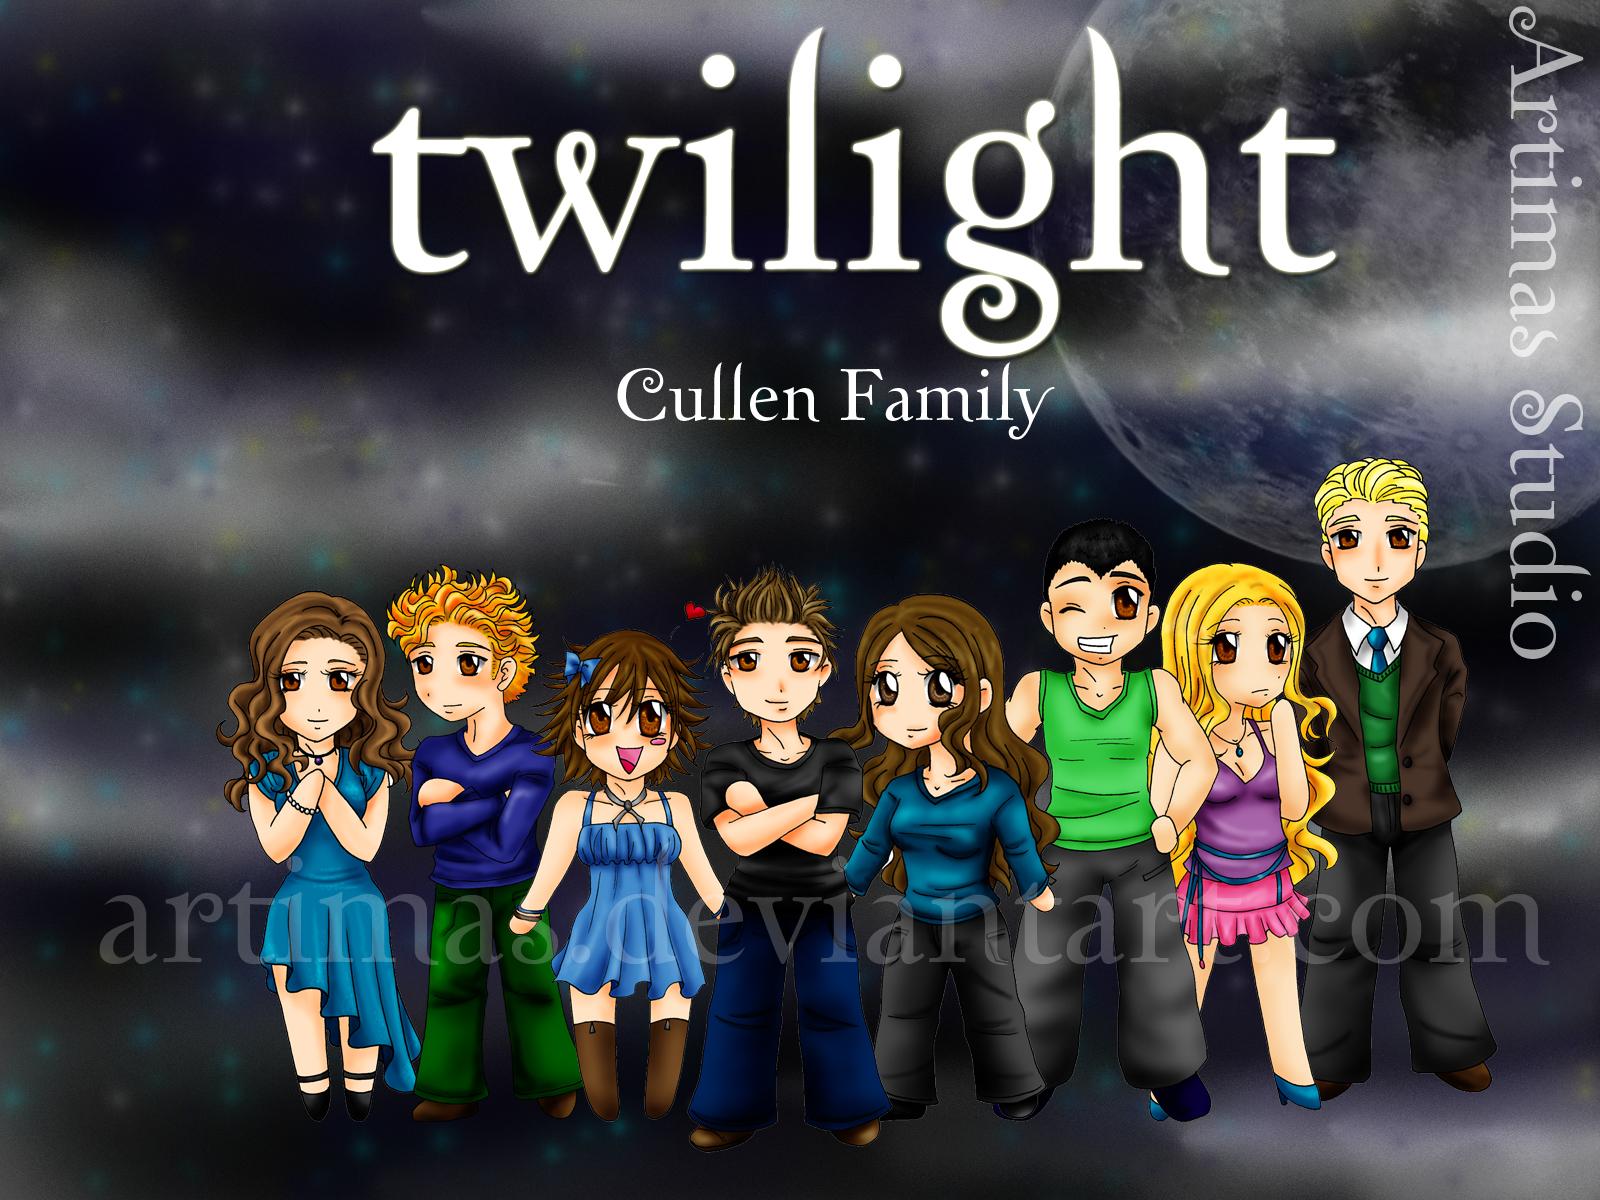 http://3.bp.blogspot.com/-JmQJY-AusYU/TyD0zcNYWXI/AAAAAAAAEK8/CNPyu9tLTbM/s1600/Twilight_Wallpaper_anime_style_by_artimas.jpg